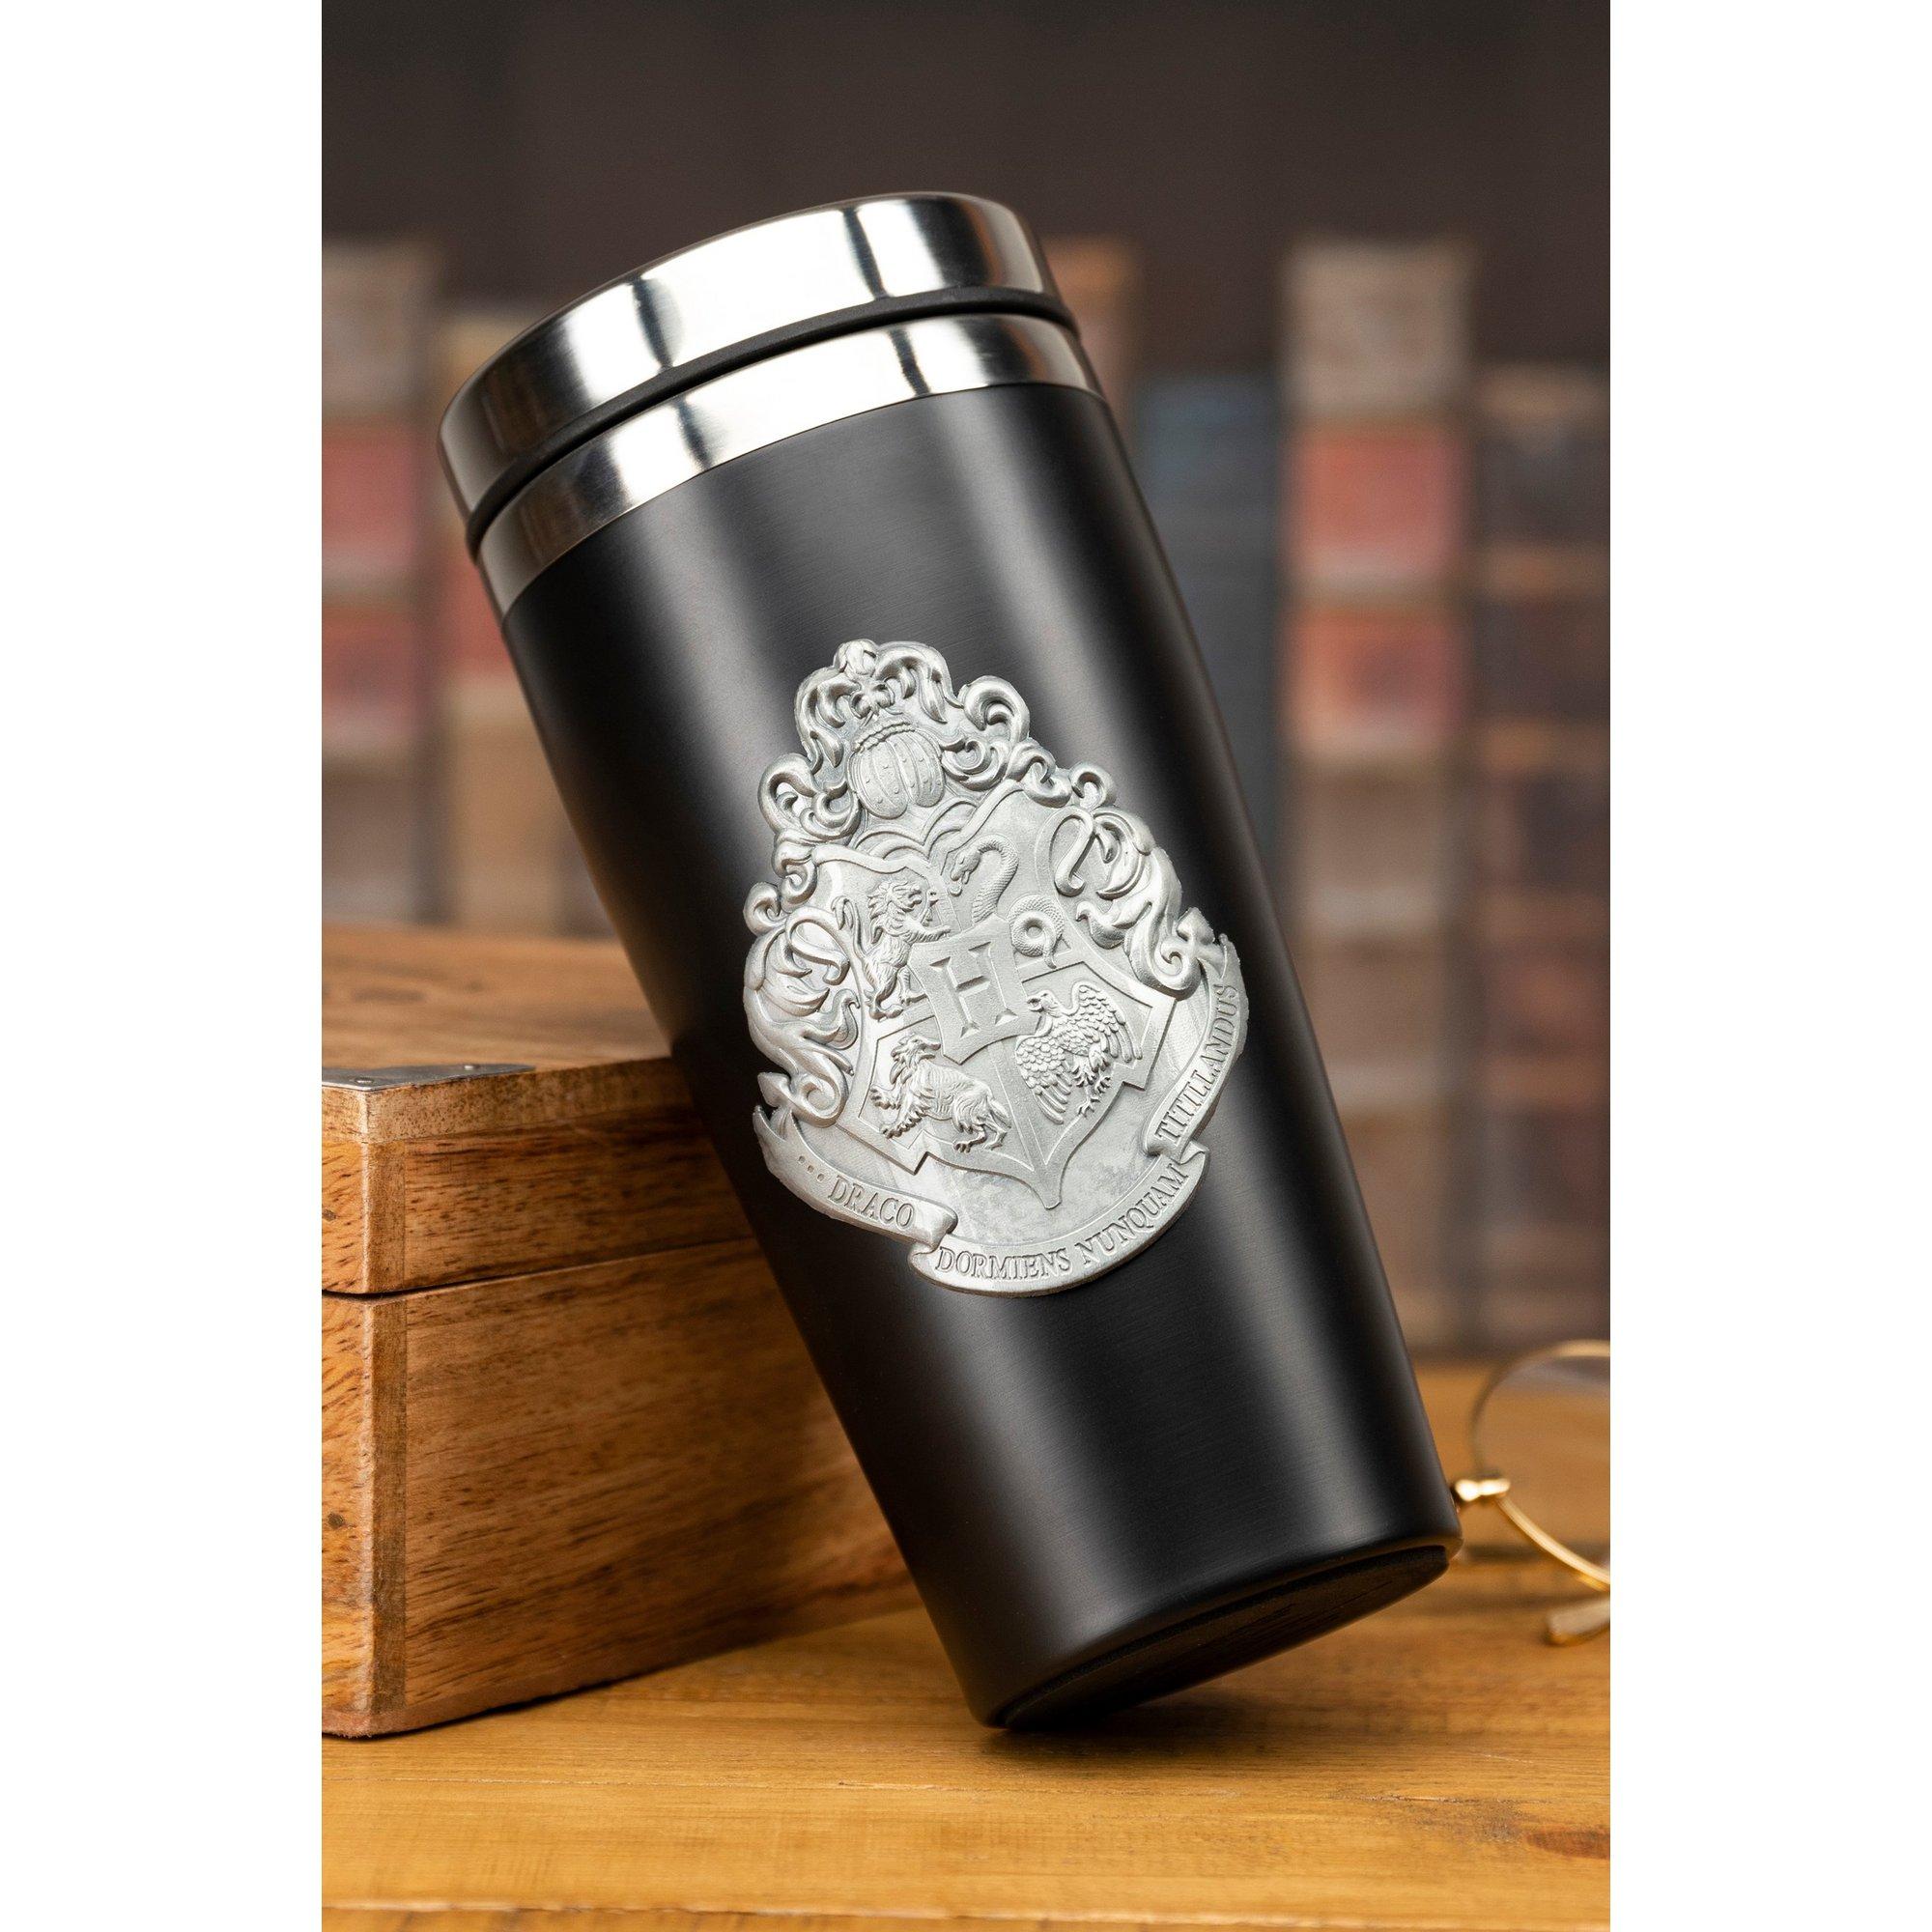 Image of Hogwarts Travel Mug with Metal Badge